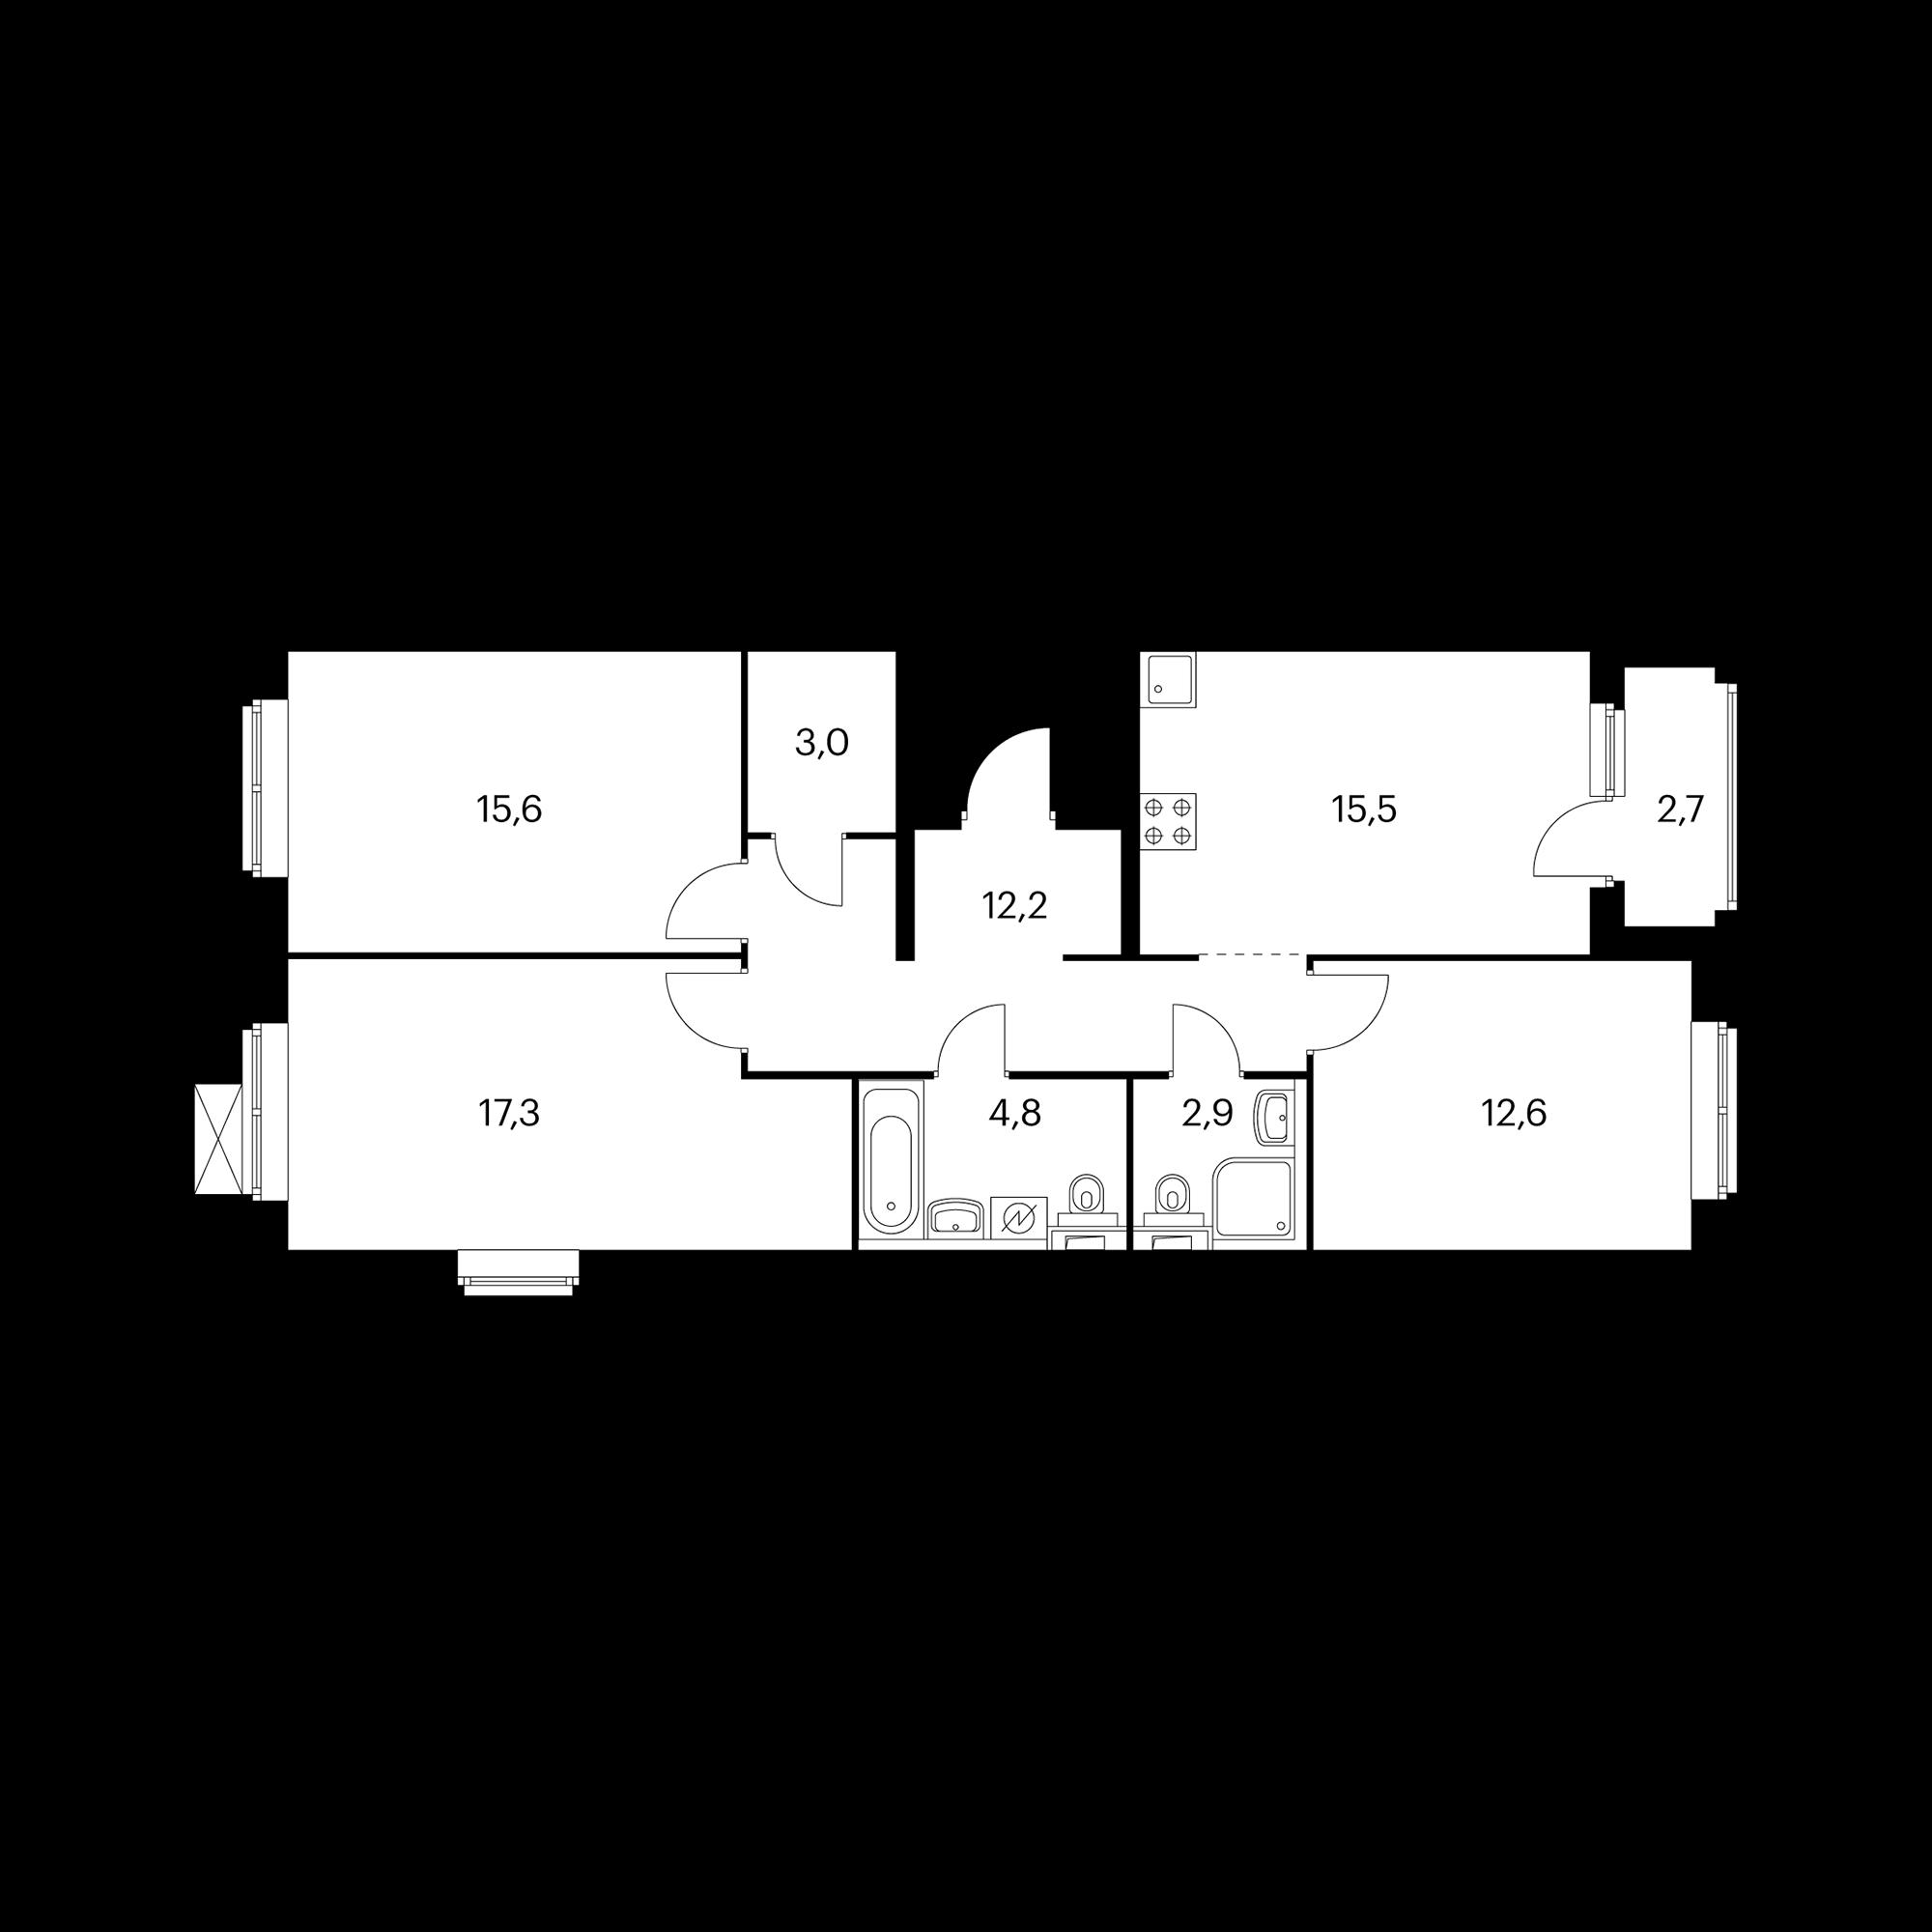 3EL5_6.6-2